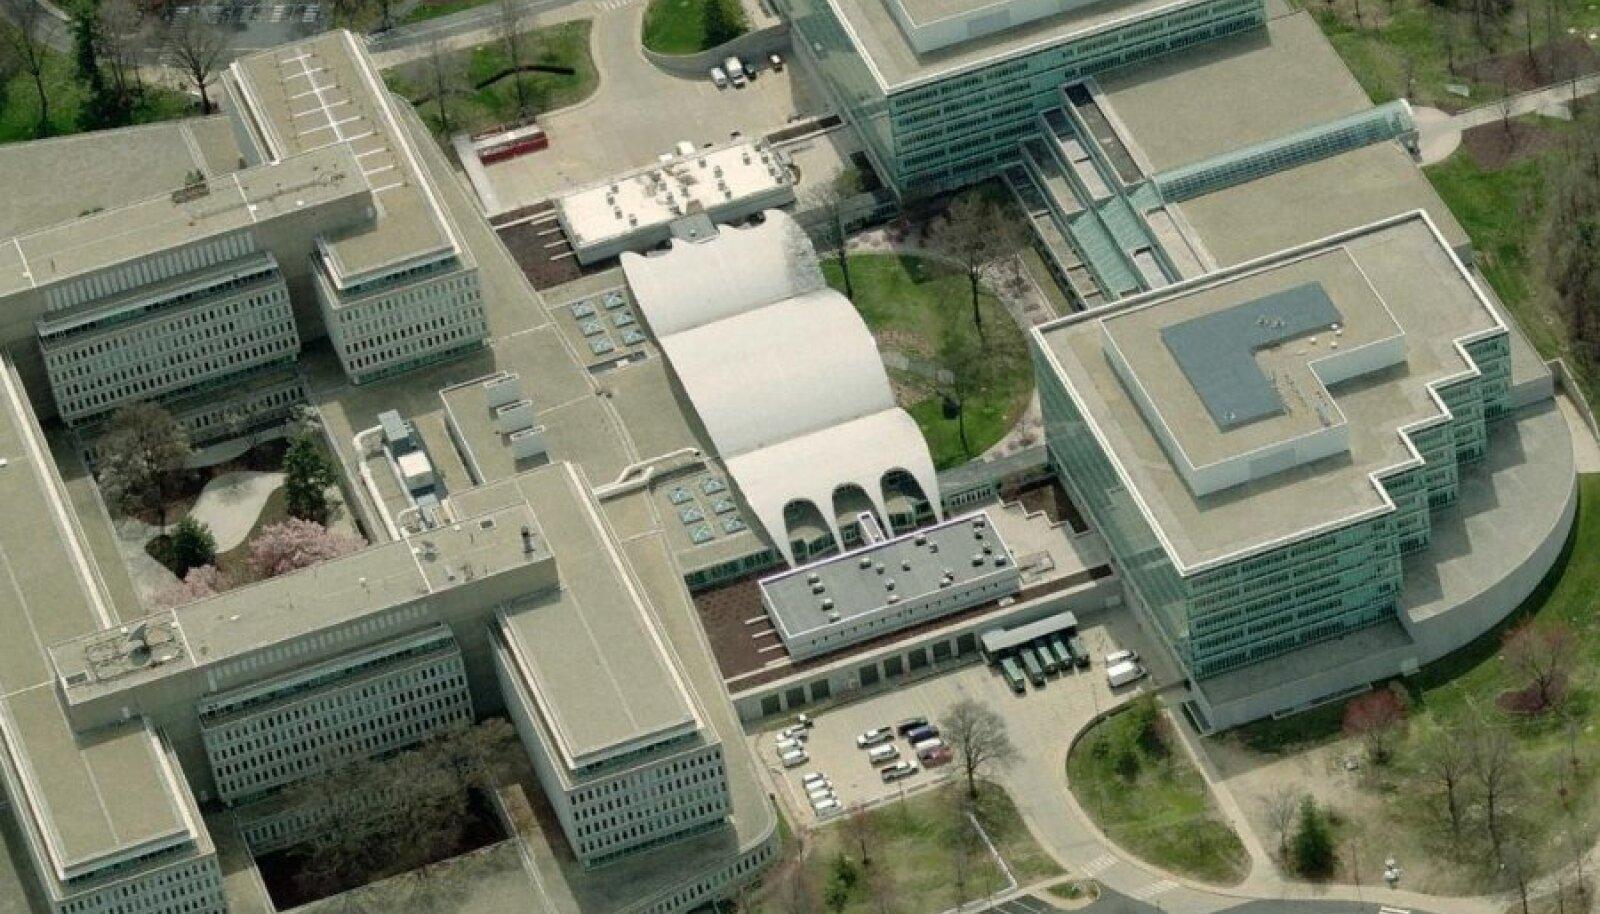 CIA peakorter Langleys. Foto: https://cryptome.org